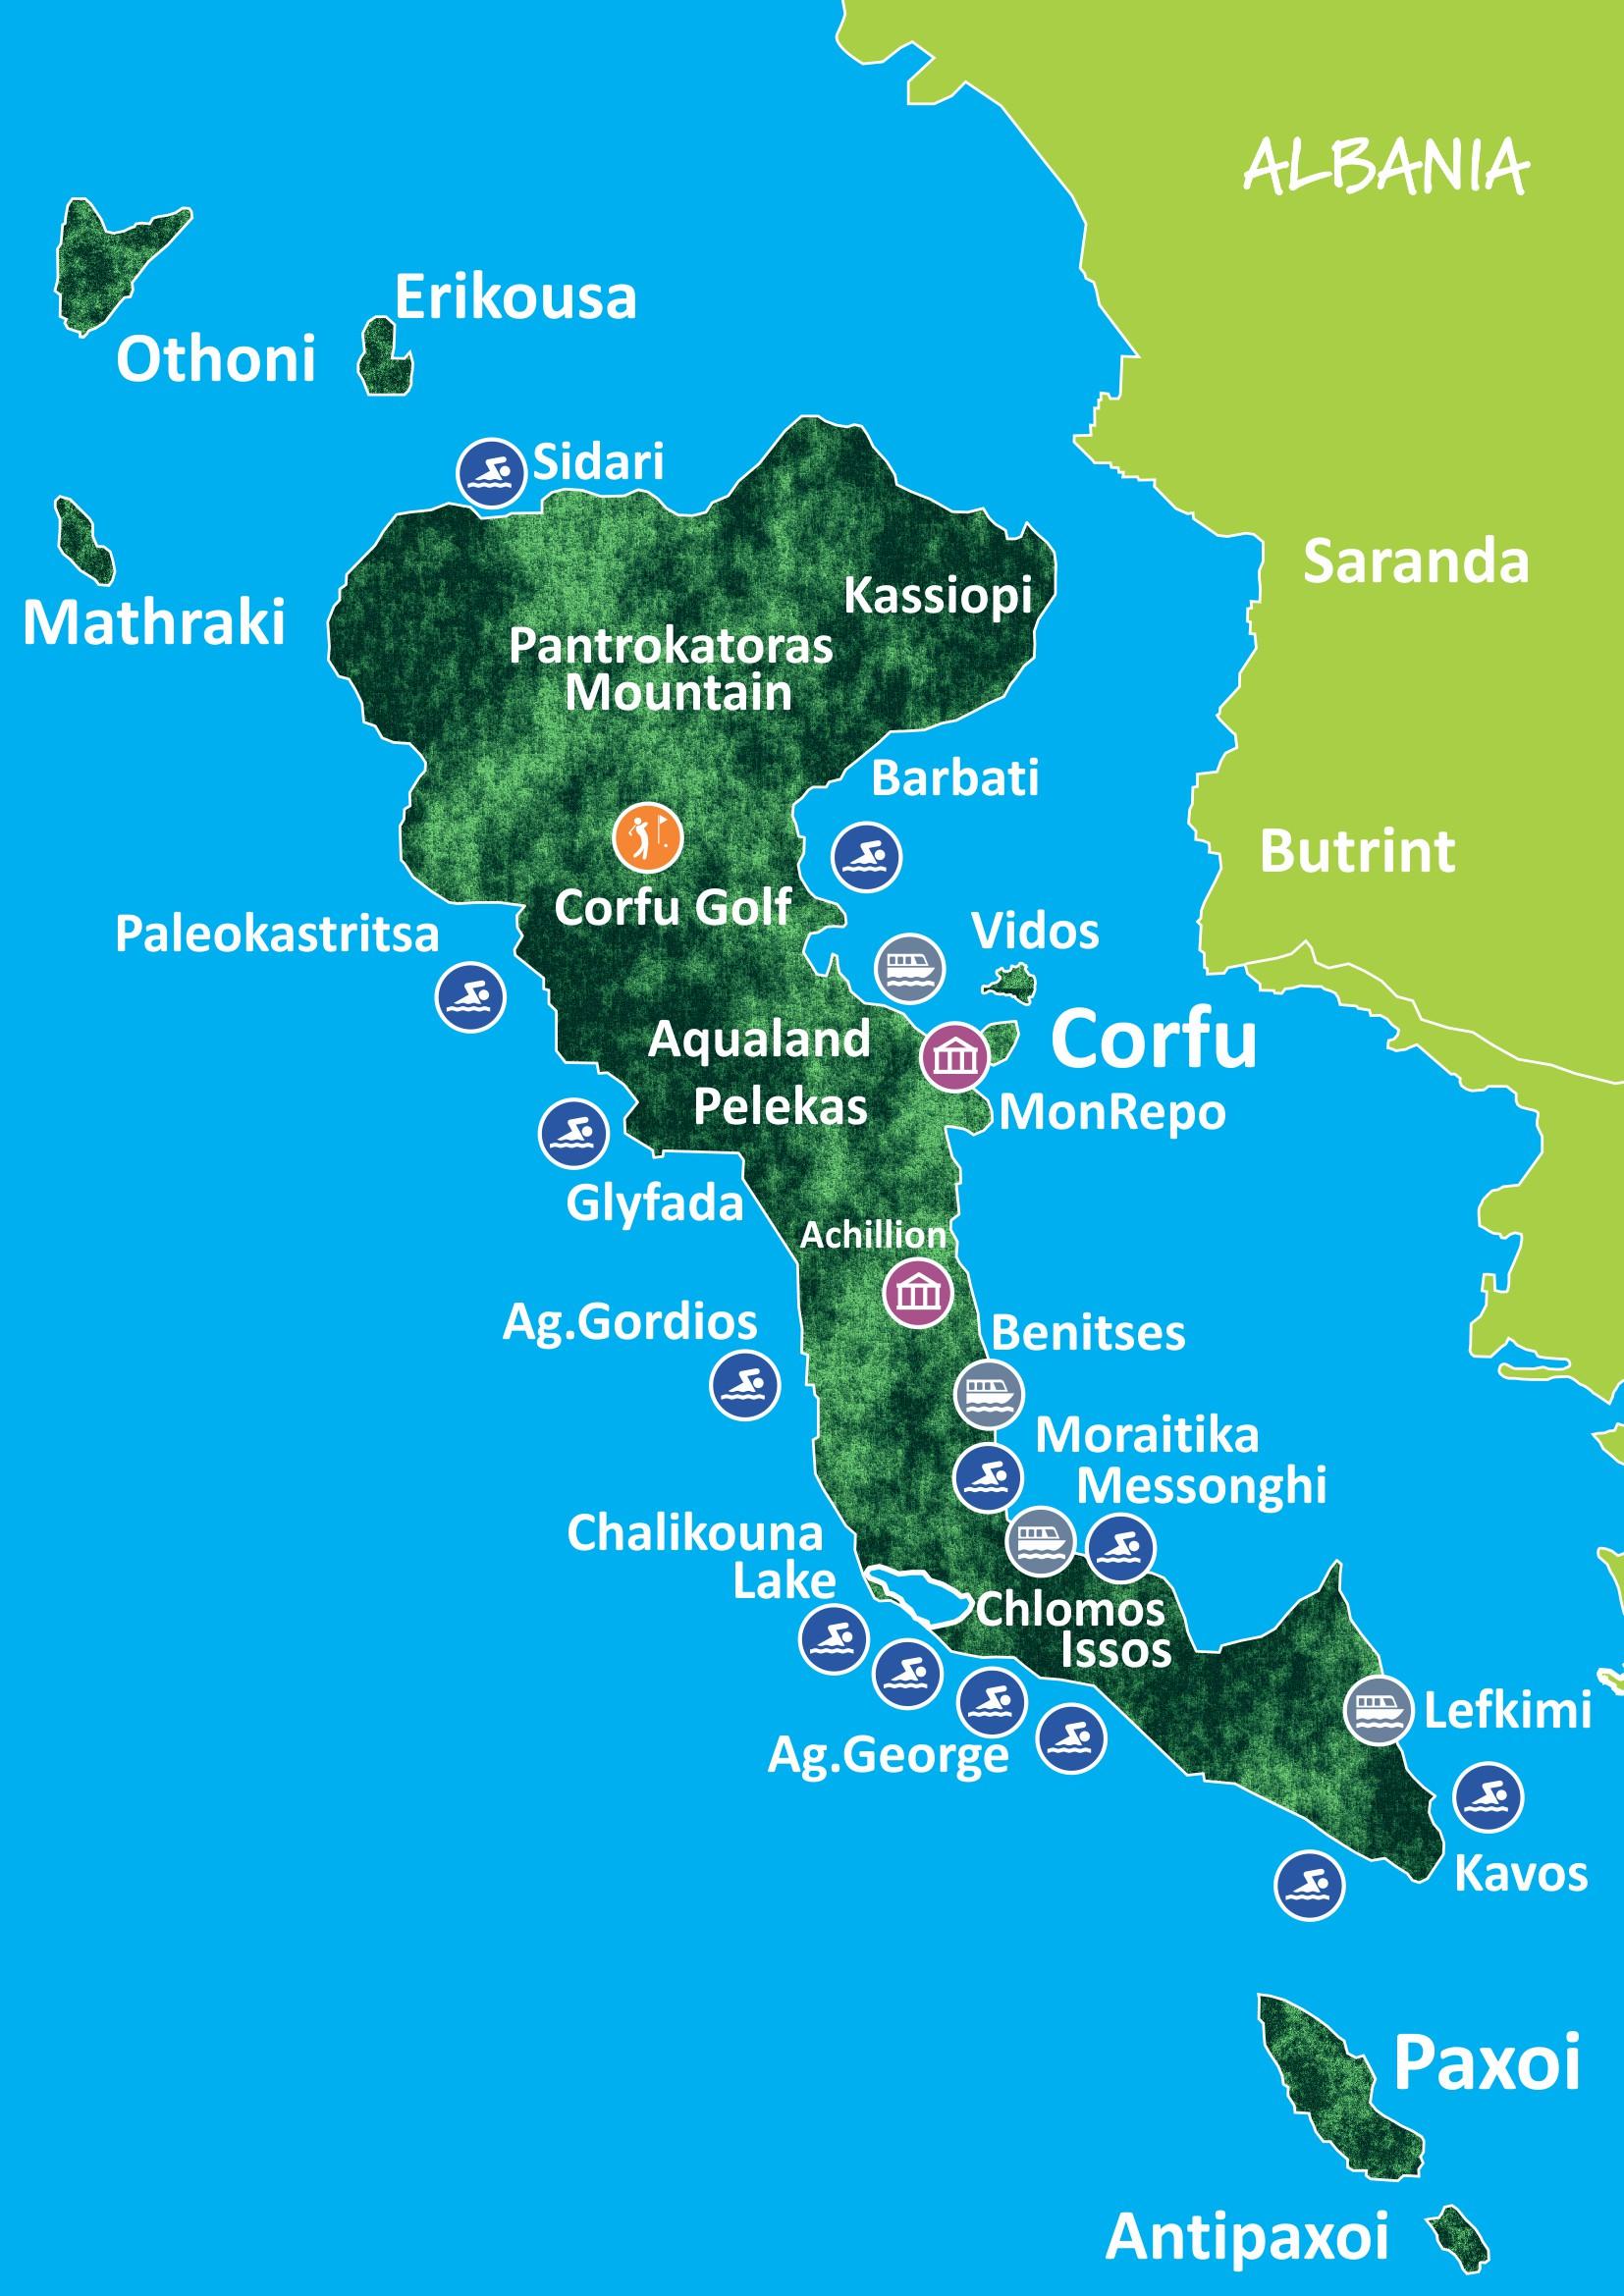 CorfuTrips.com Map Of Corfu Achilleion on ferry from saranda to corfu, acharavi beach corfu, canal d'amour corfu, greek island corfu, things to do in corfu, best hotels in corfu, achilles corfu, royal palace on corfu, paleokastritsa corfu, greece corfu,